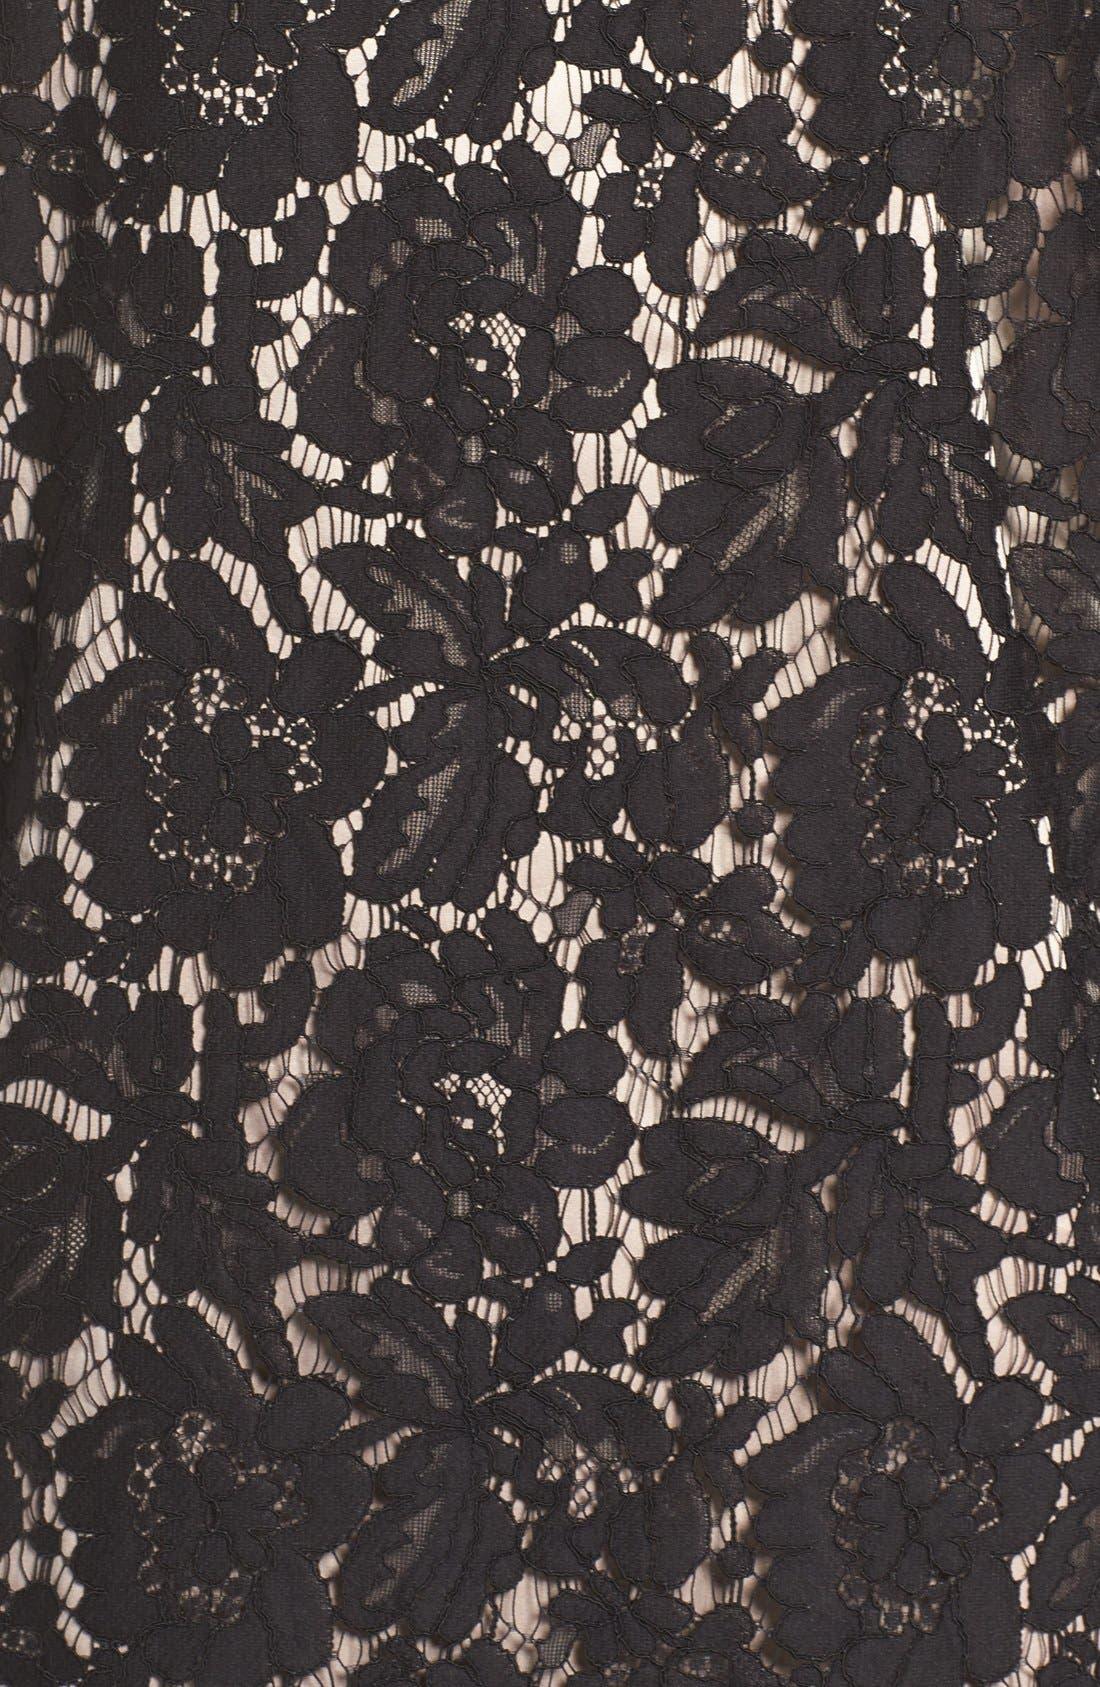 Cold Shoulder Lace Shift Dress,                             Alternate thumbnail 6, color,                             Black